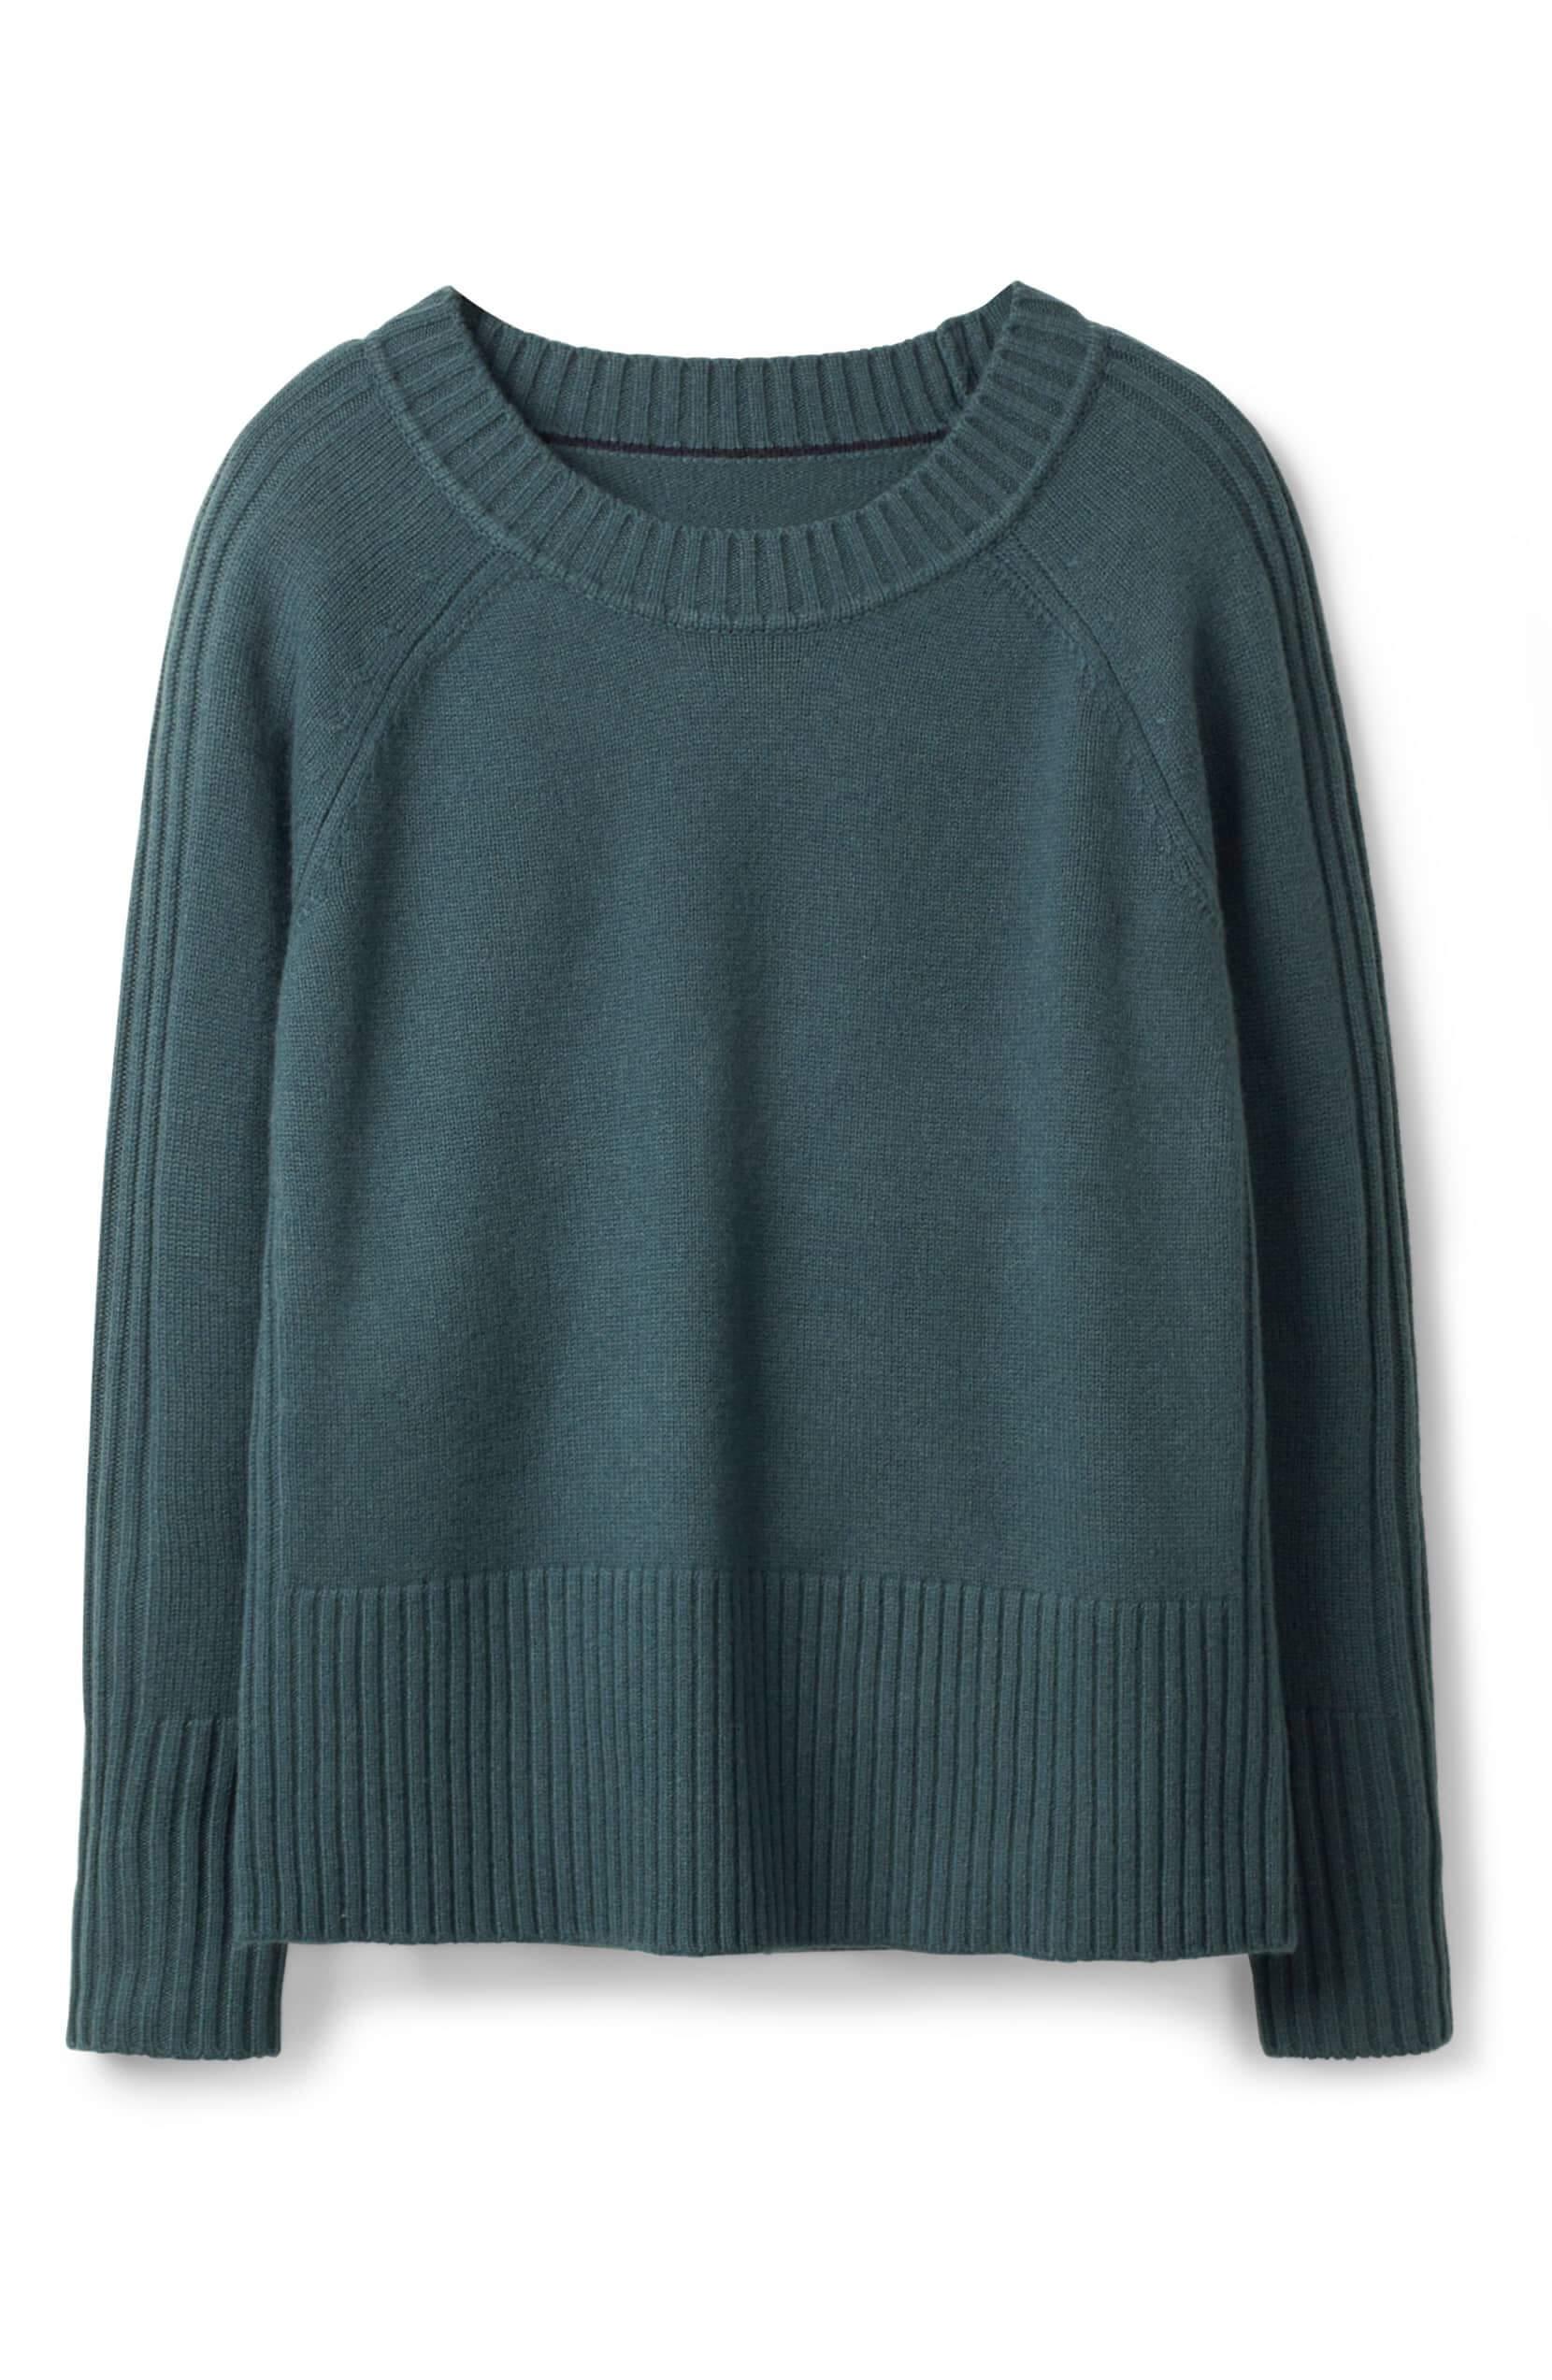 Heidi ribbed sleeve wool cashmere sweater